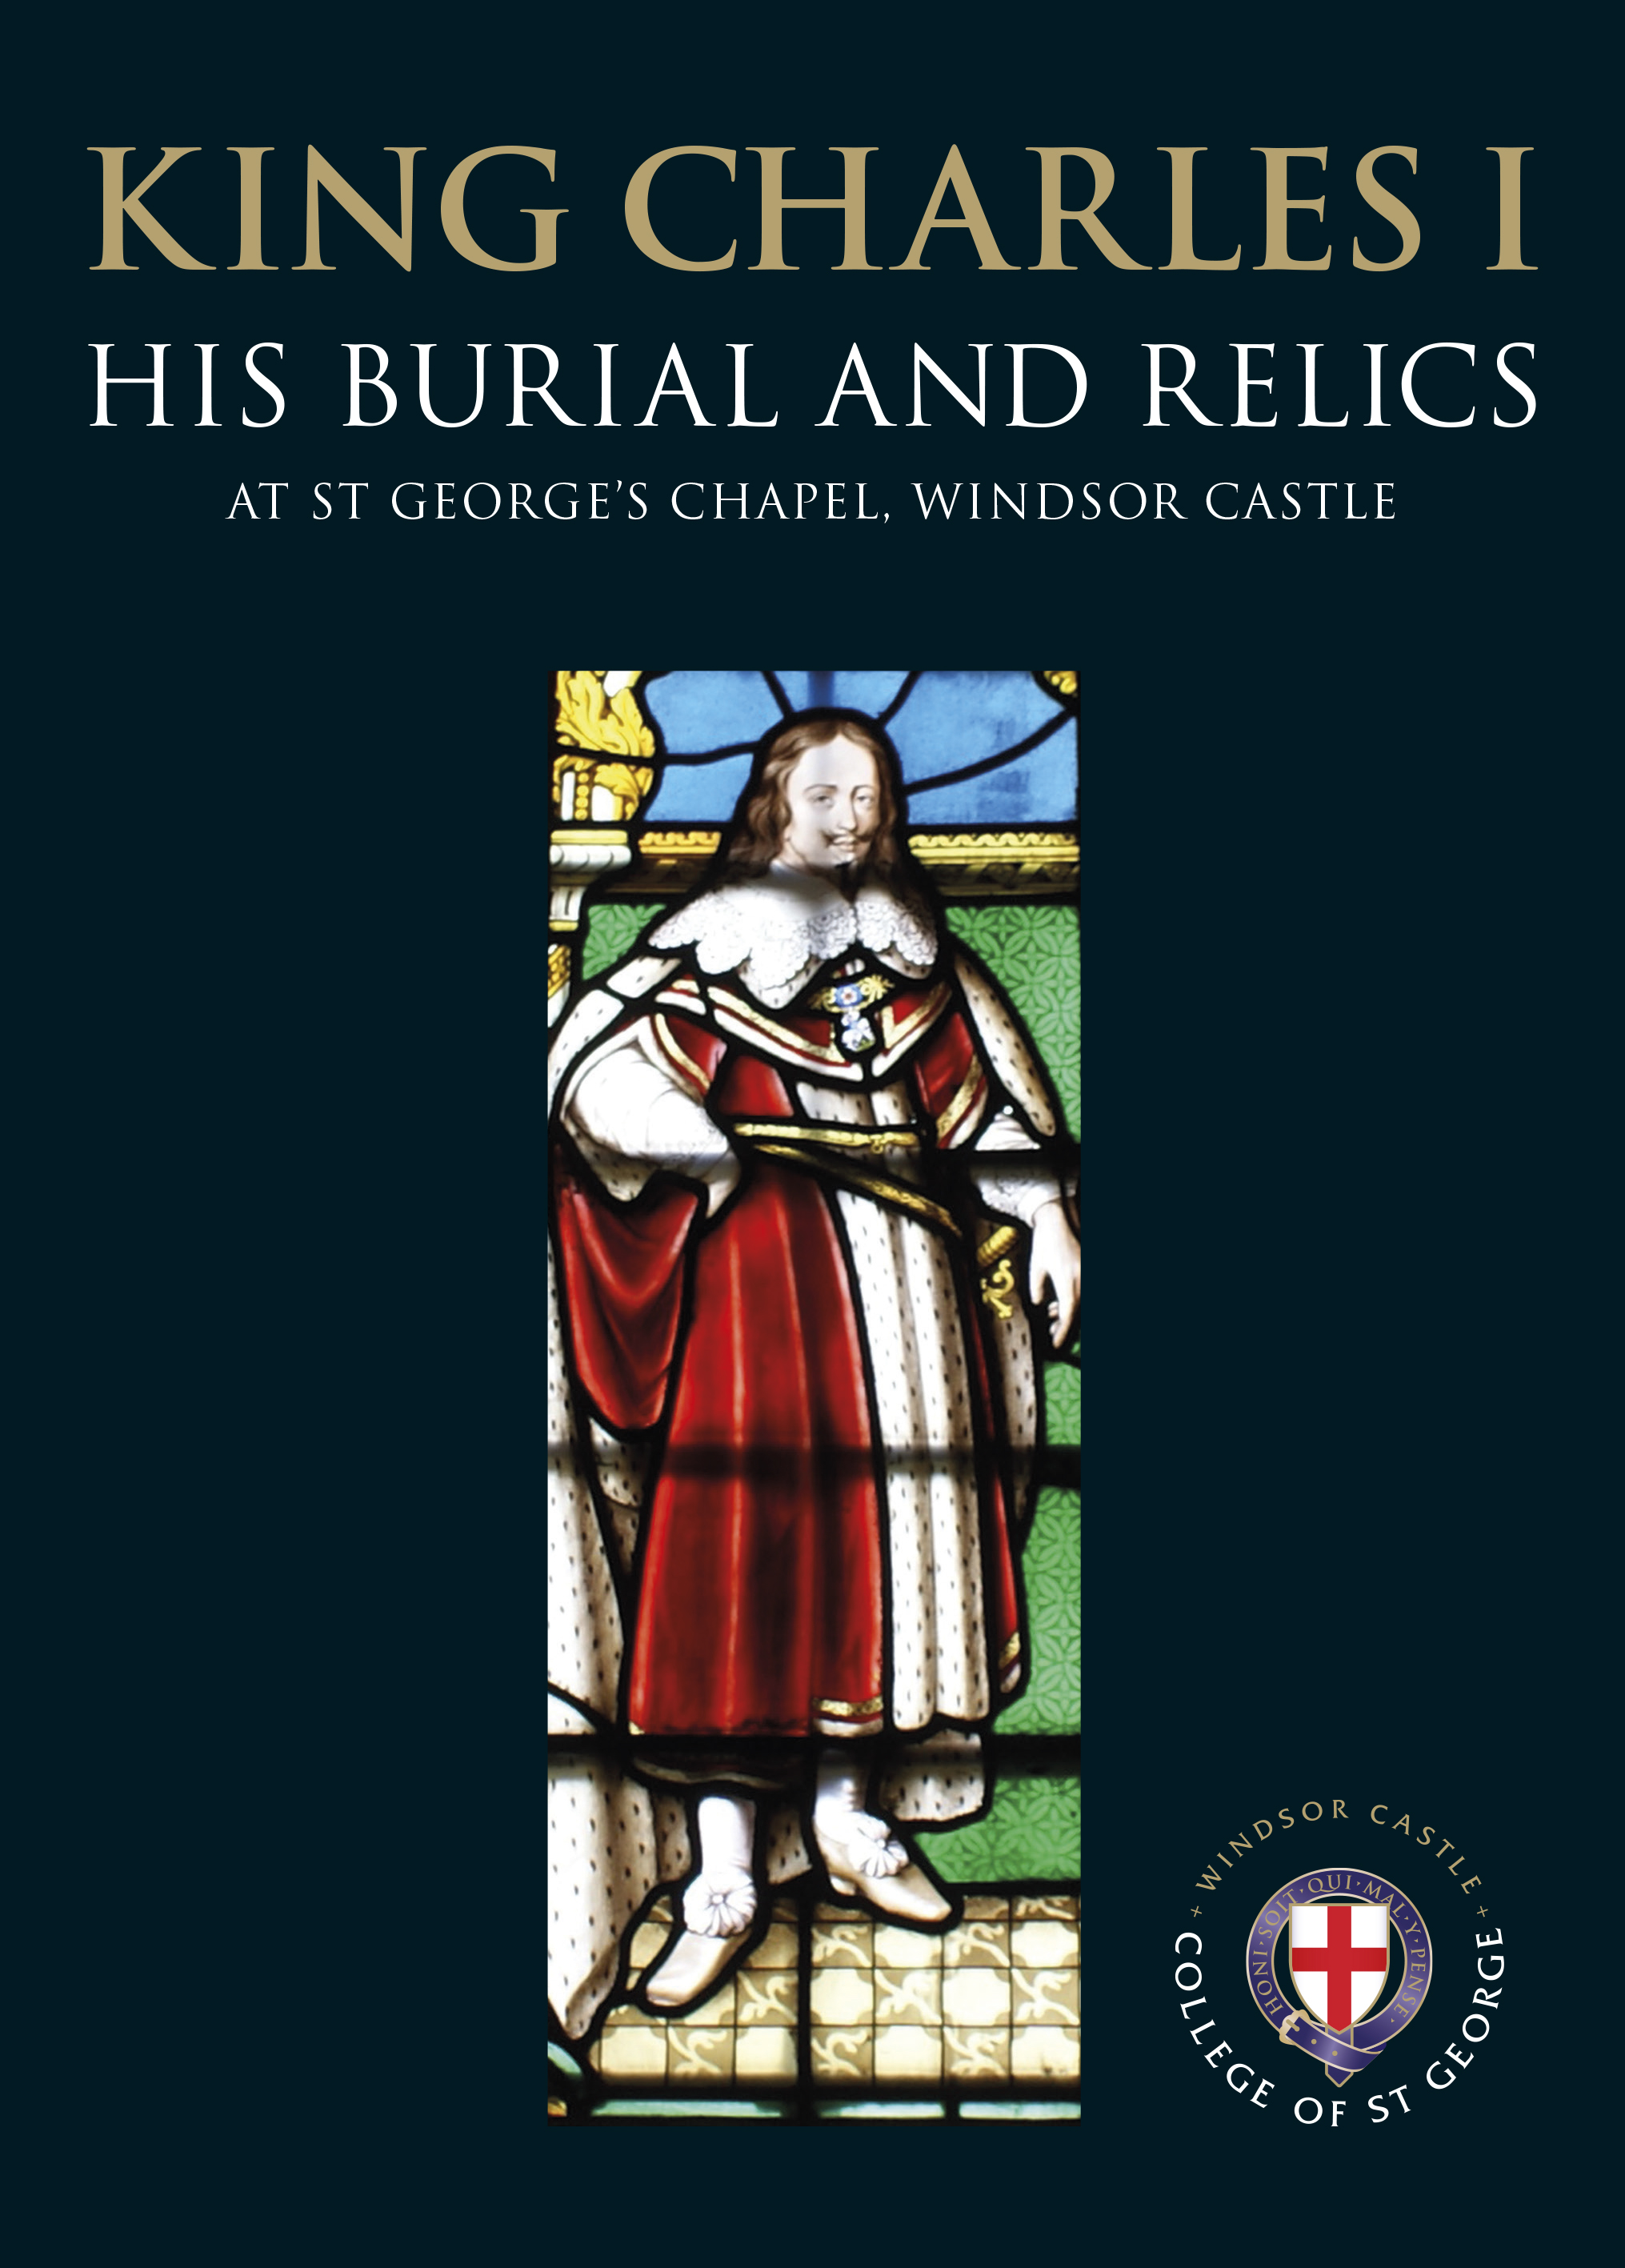 Charles I Guidebook